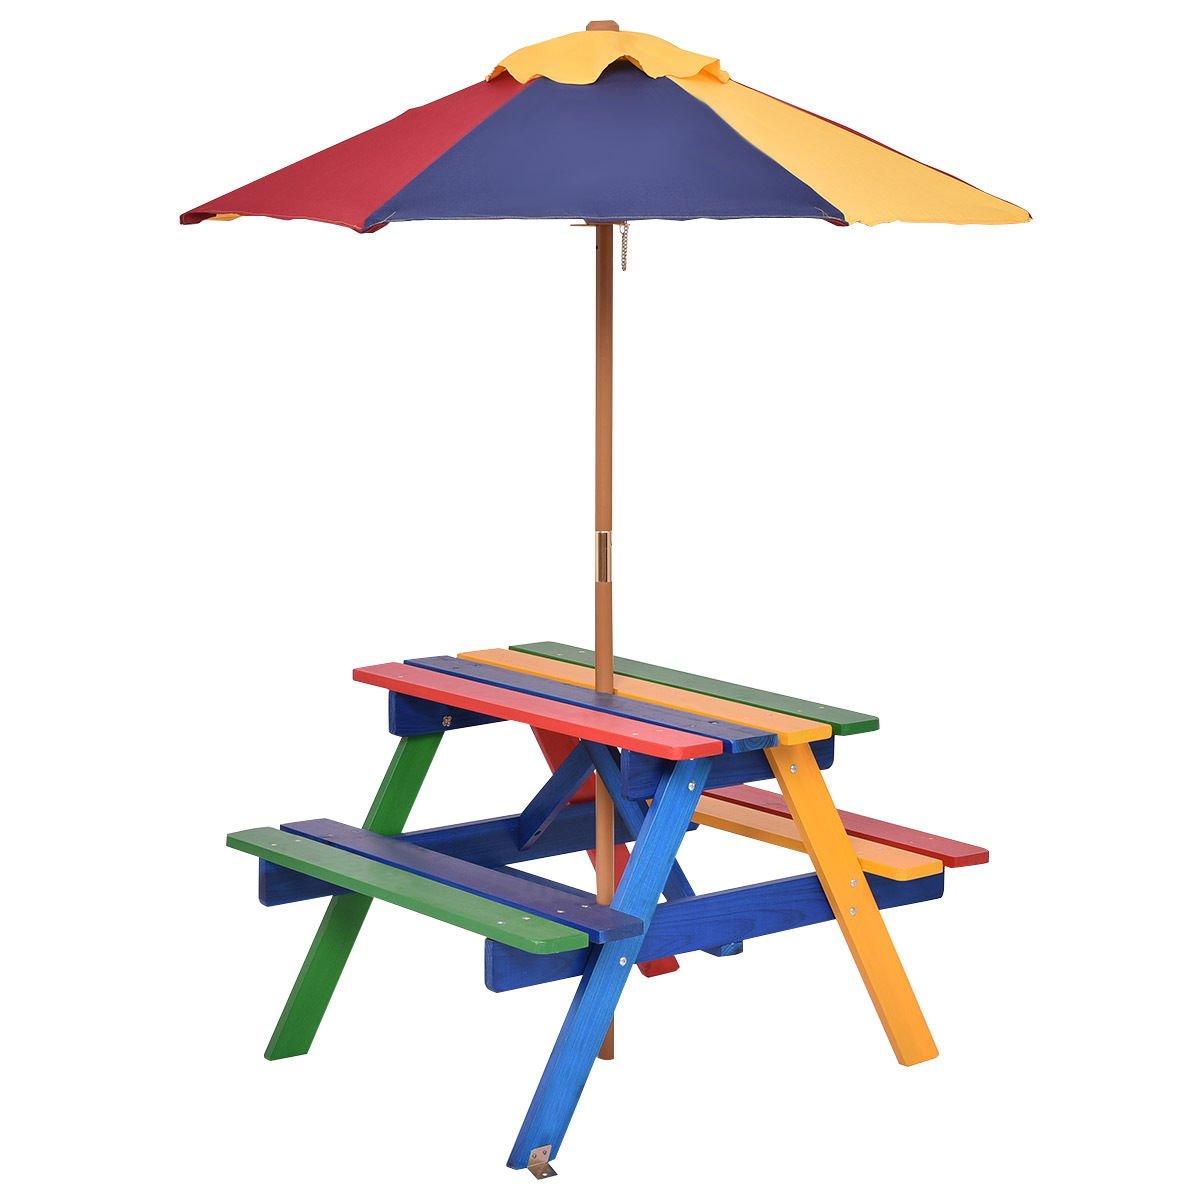 allblessings Folding 4座席子供ピクニックテーブルW /傘Garden Yardベンチアウトドアfor Children B07BV7CXB3